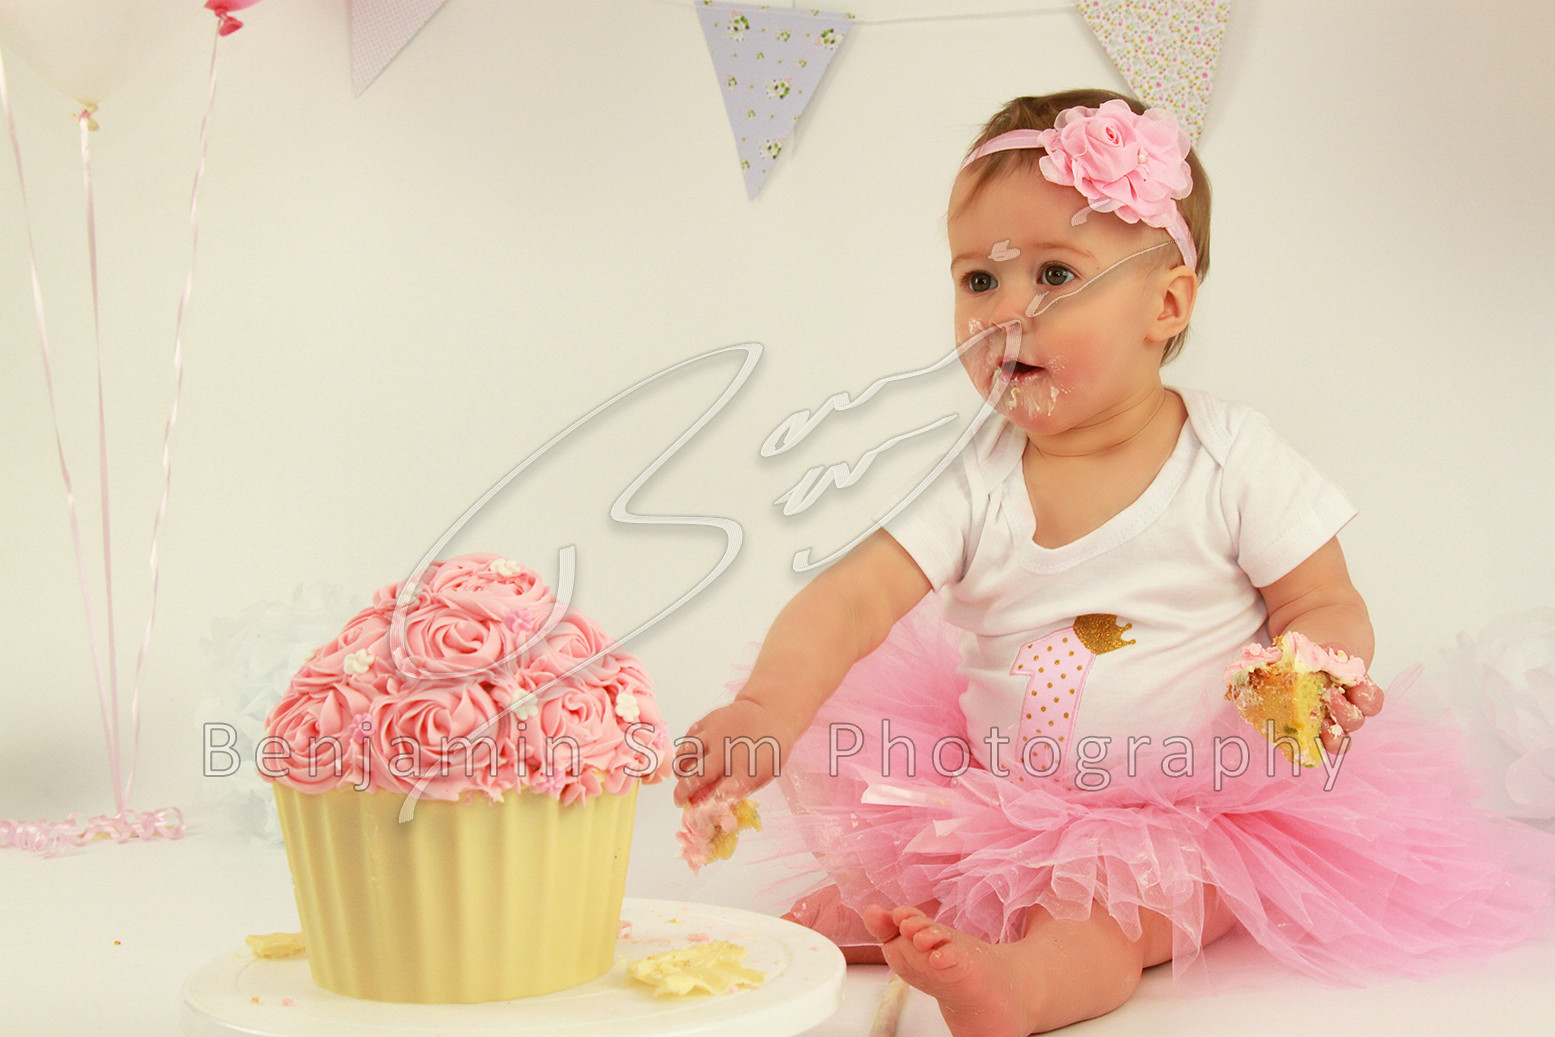 Cake - WM - 001